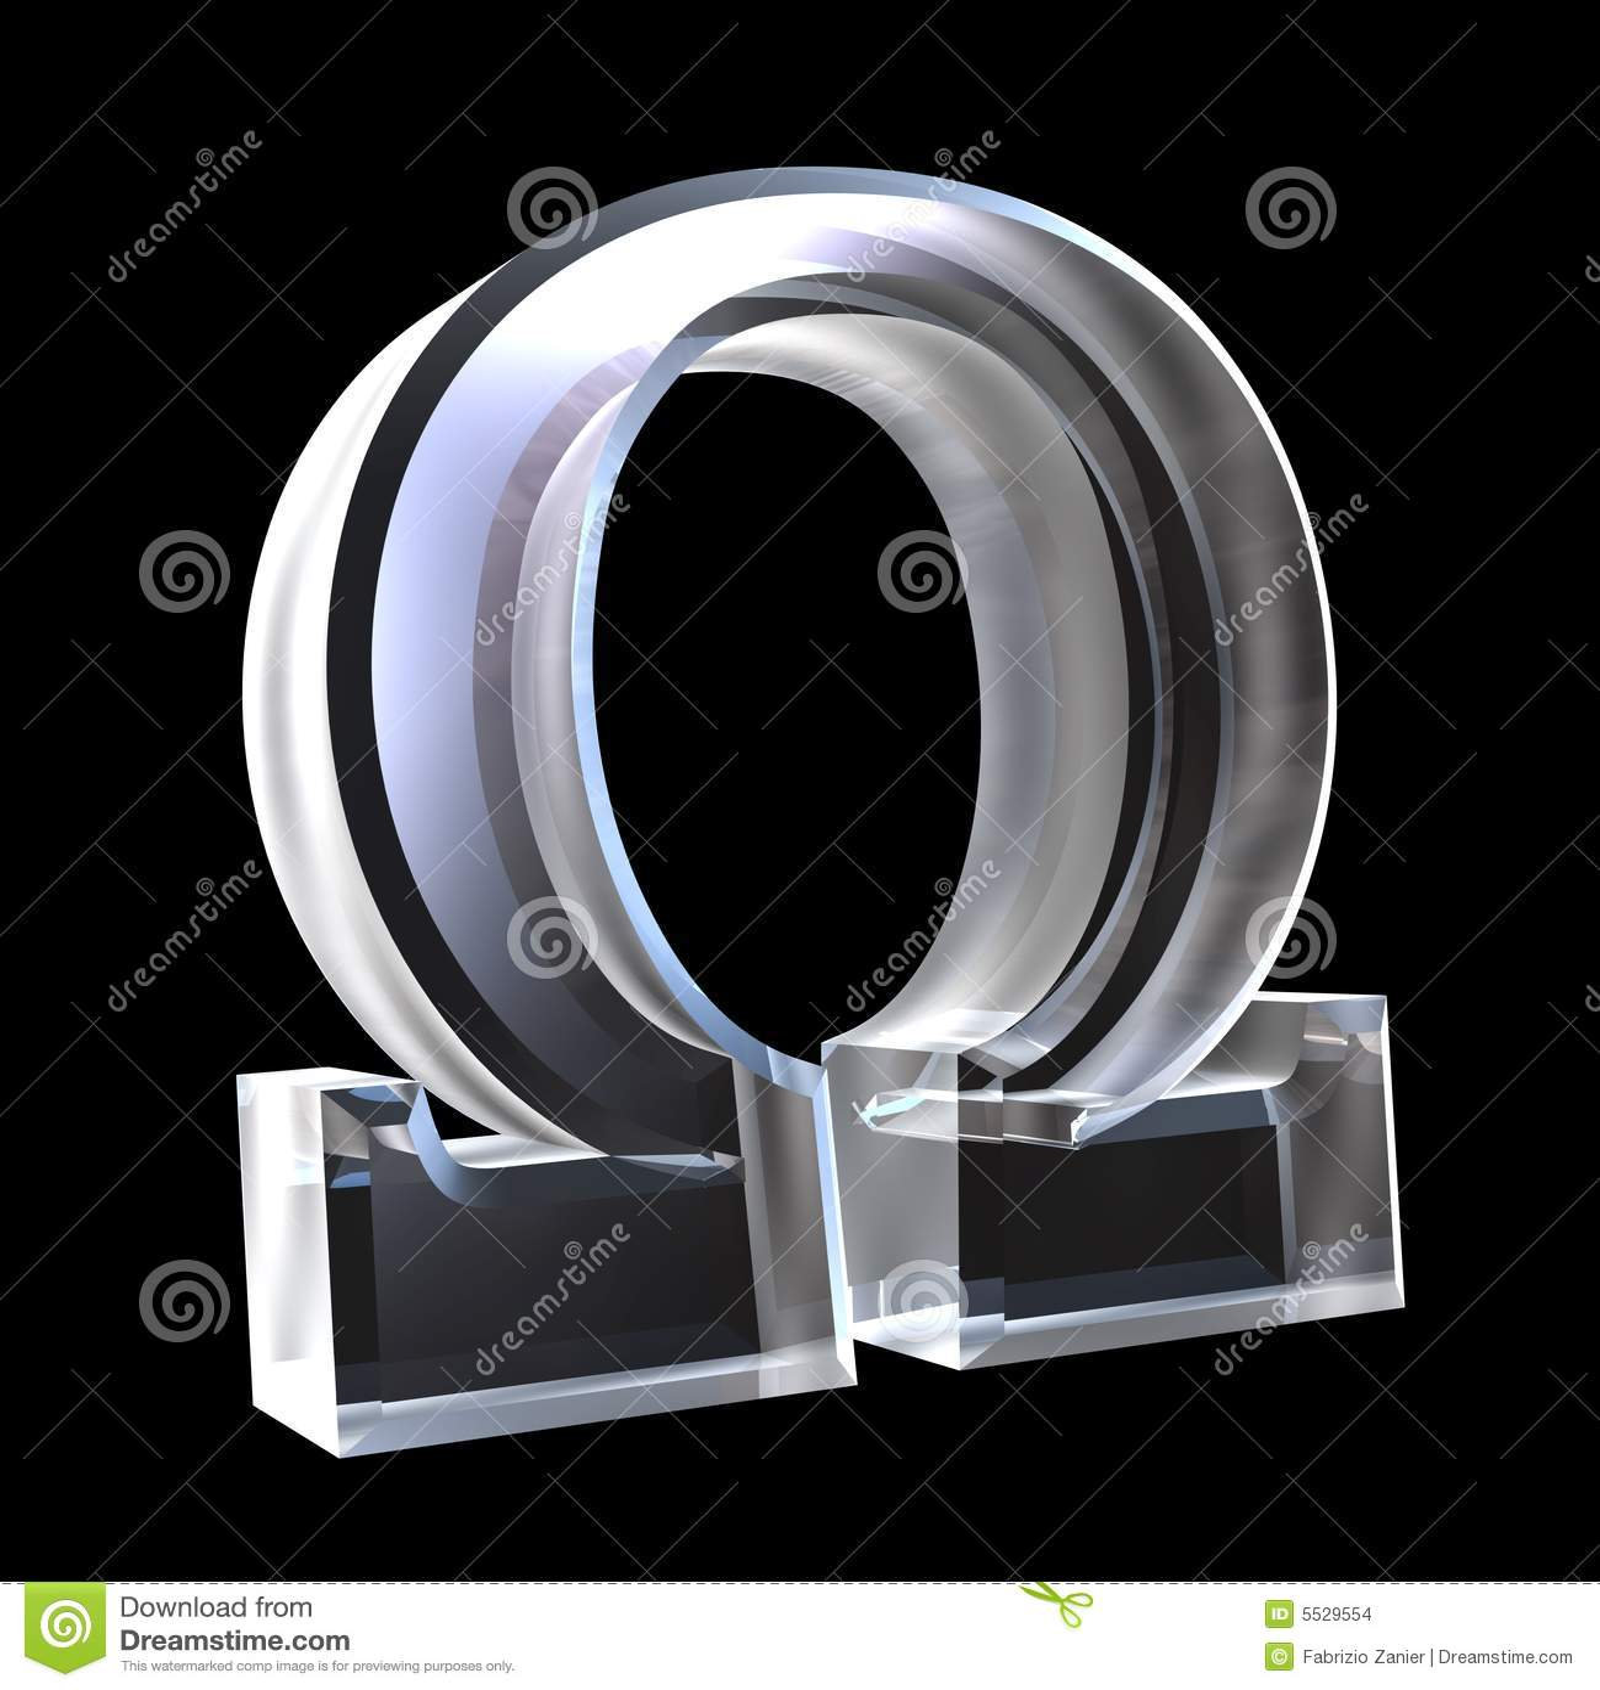 Gamma symbol in glass 3d stock illustration illustration of omega symbol in glass 3d stock images biocorpaavc Gallery